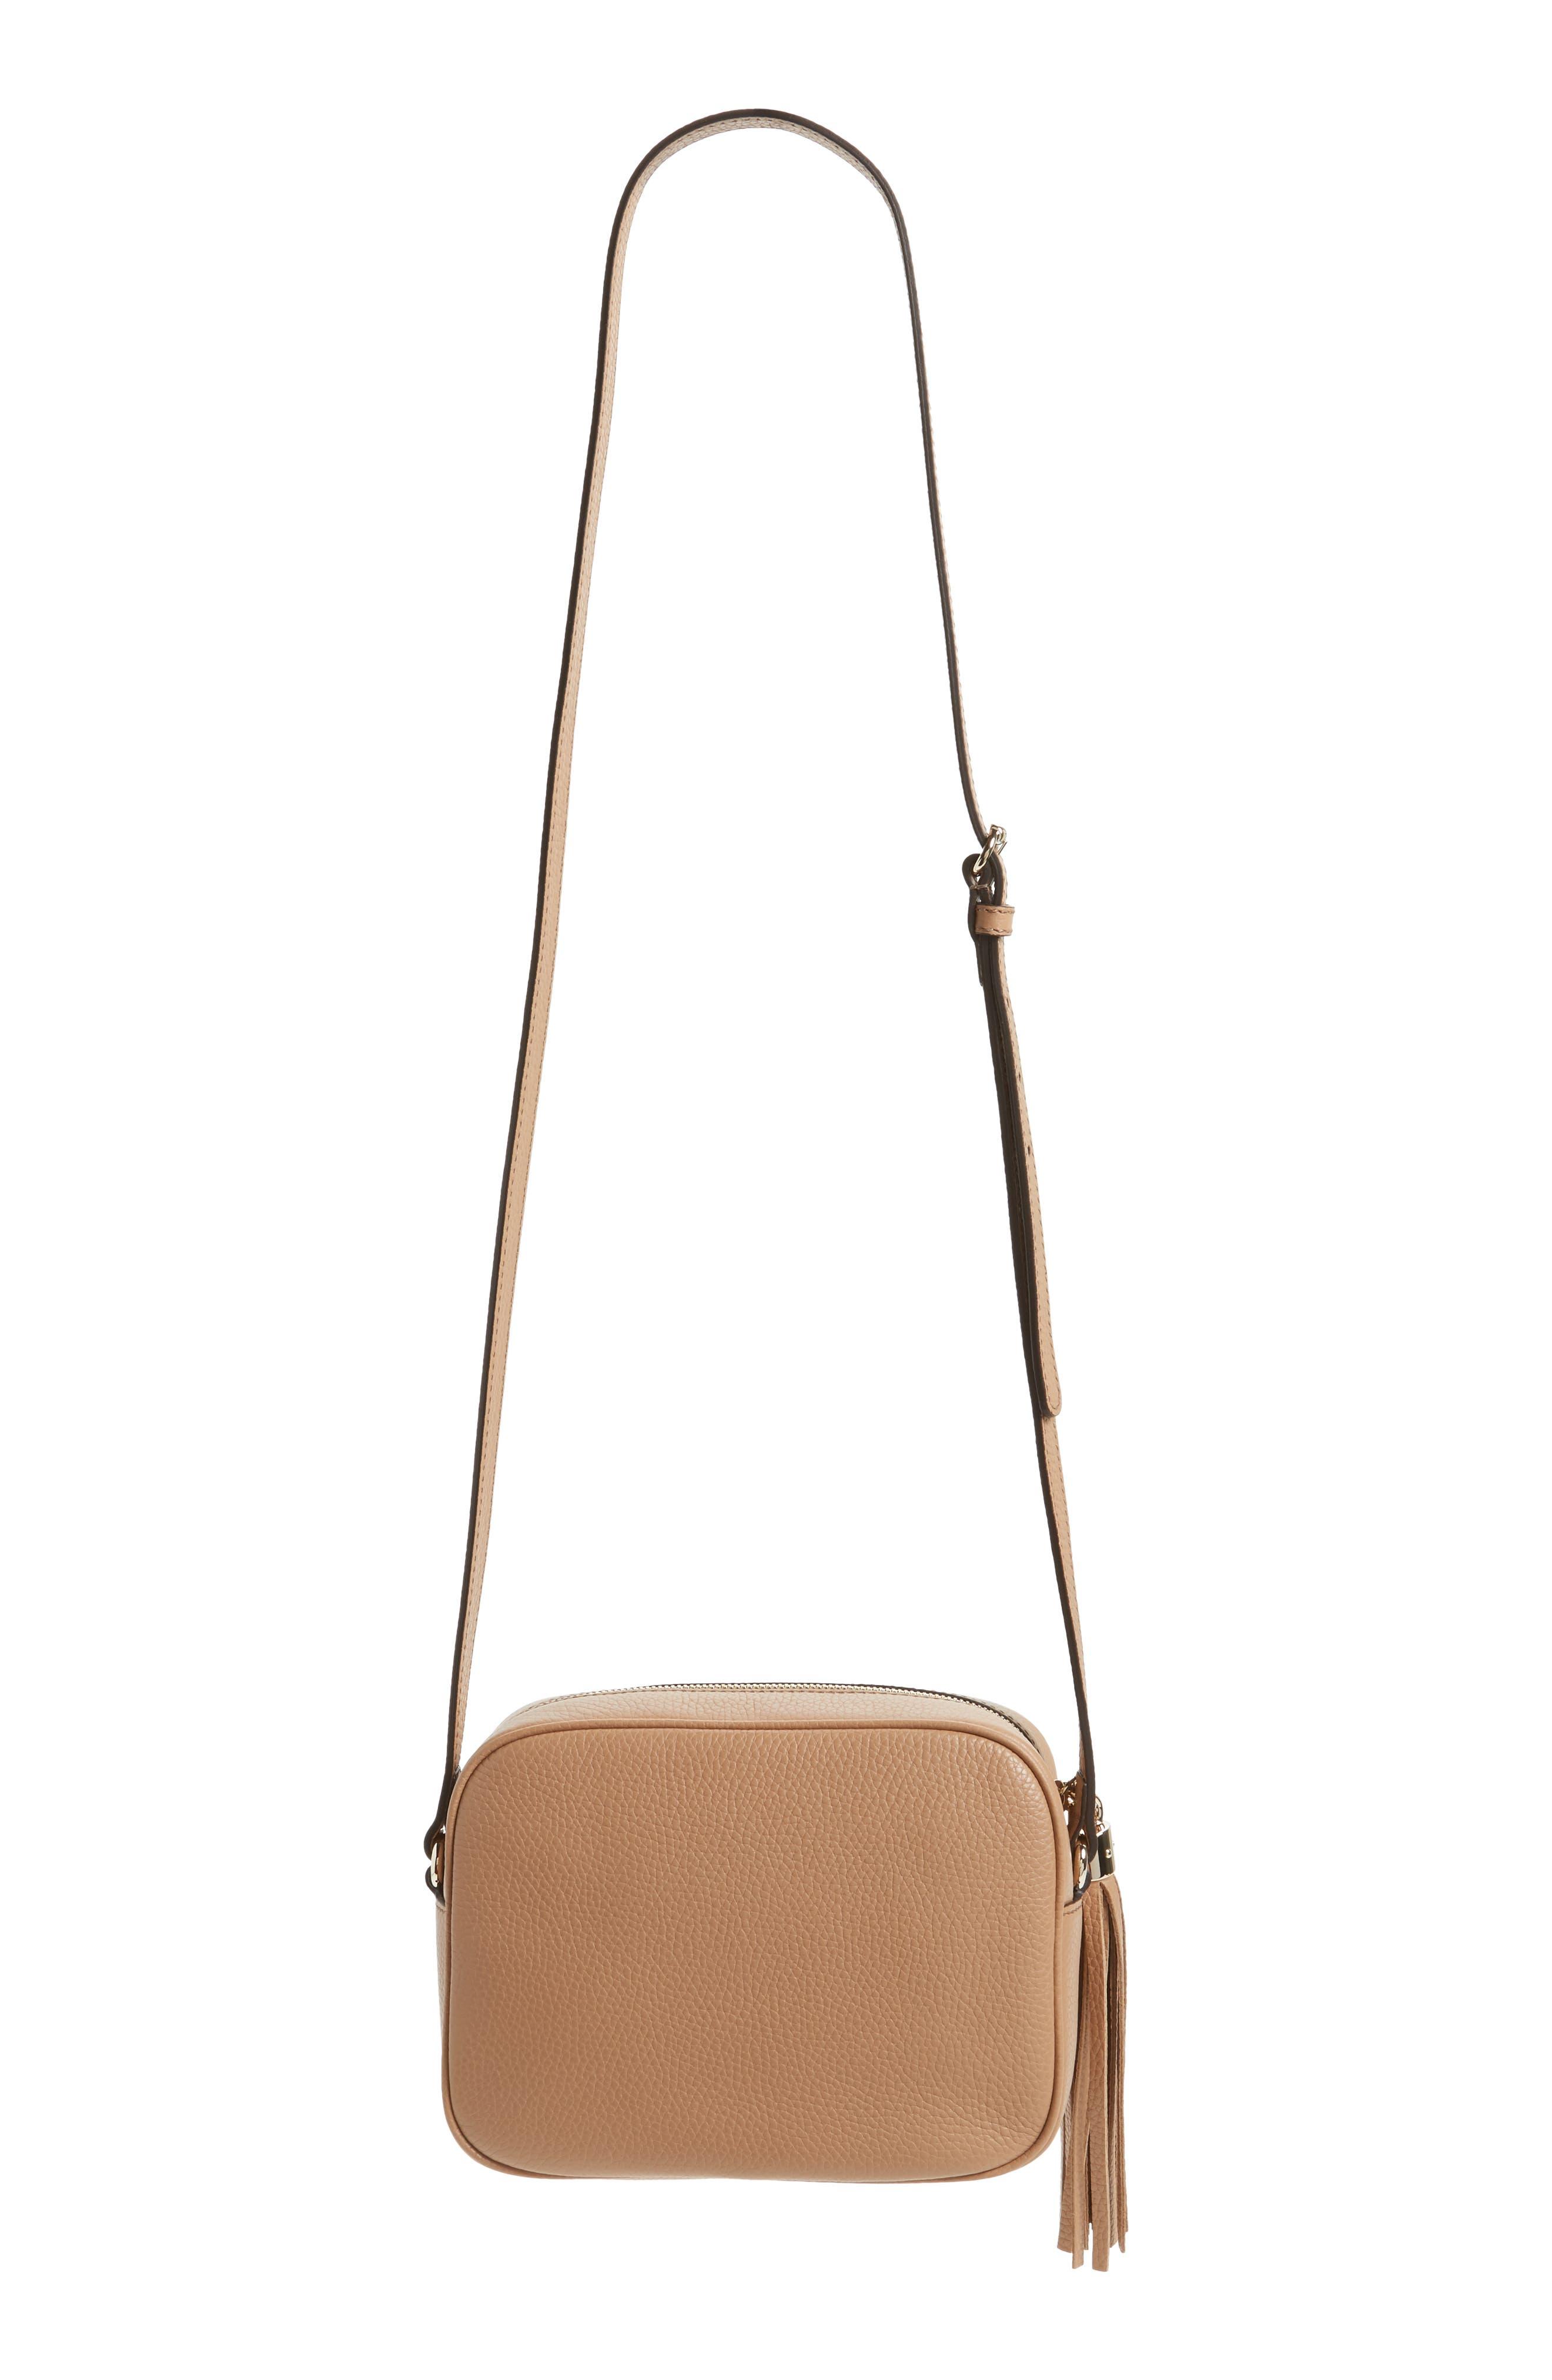 GUCCI, Soho Disco Leather Bag, Alternate thumbnail 3, color, 2754 CAMELIA